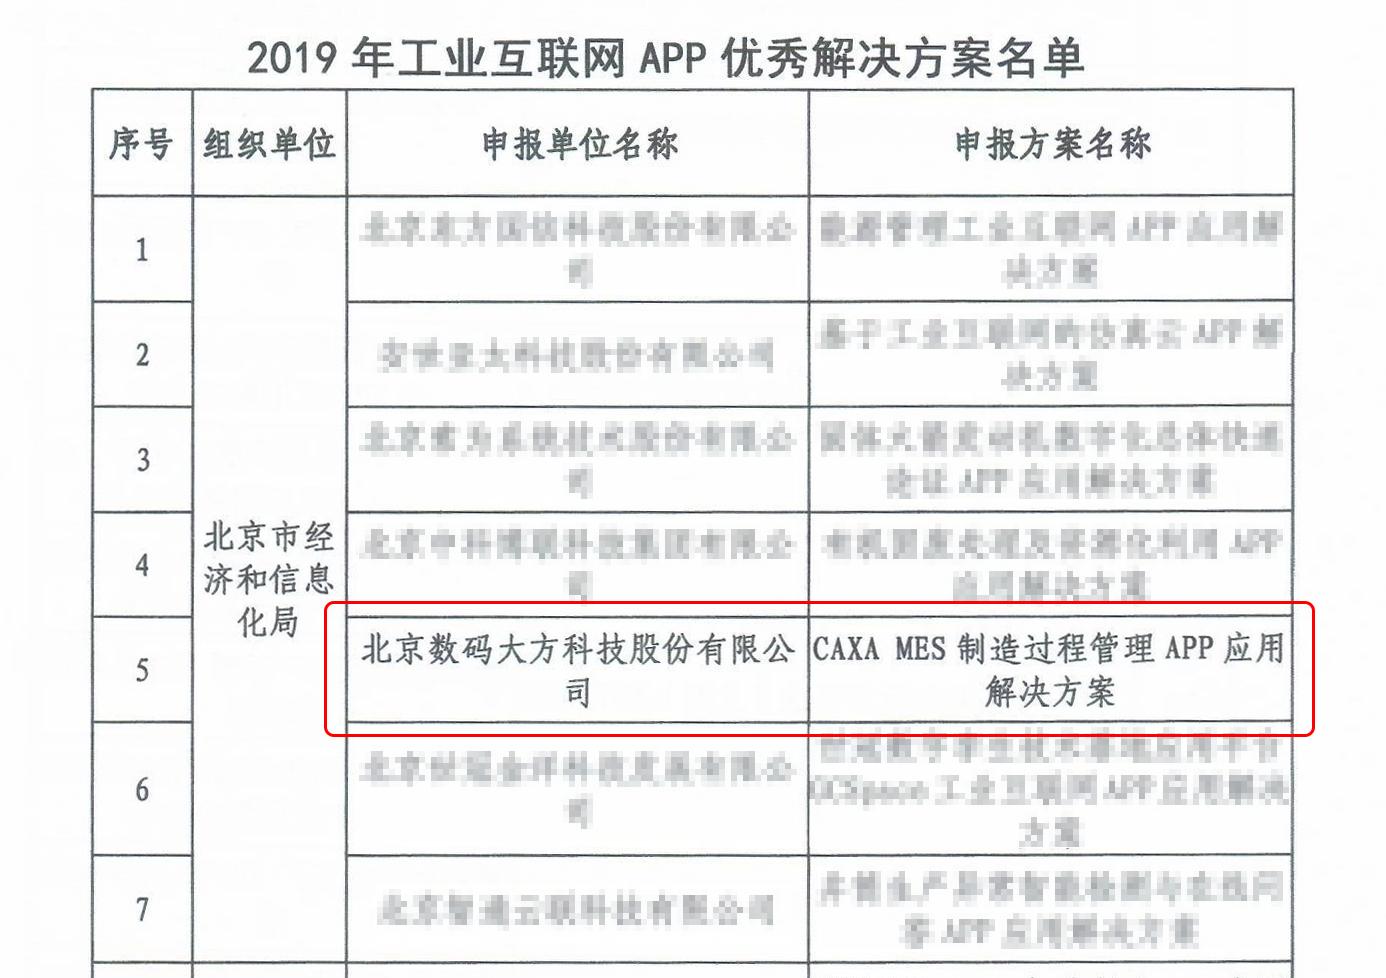 优秀APP名单截图-处理.png